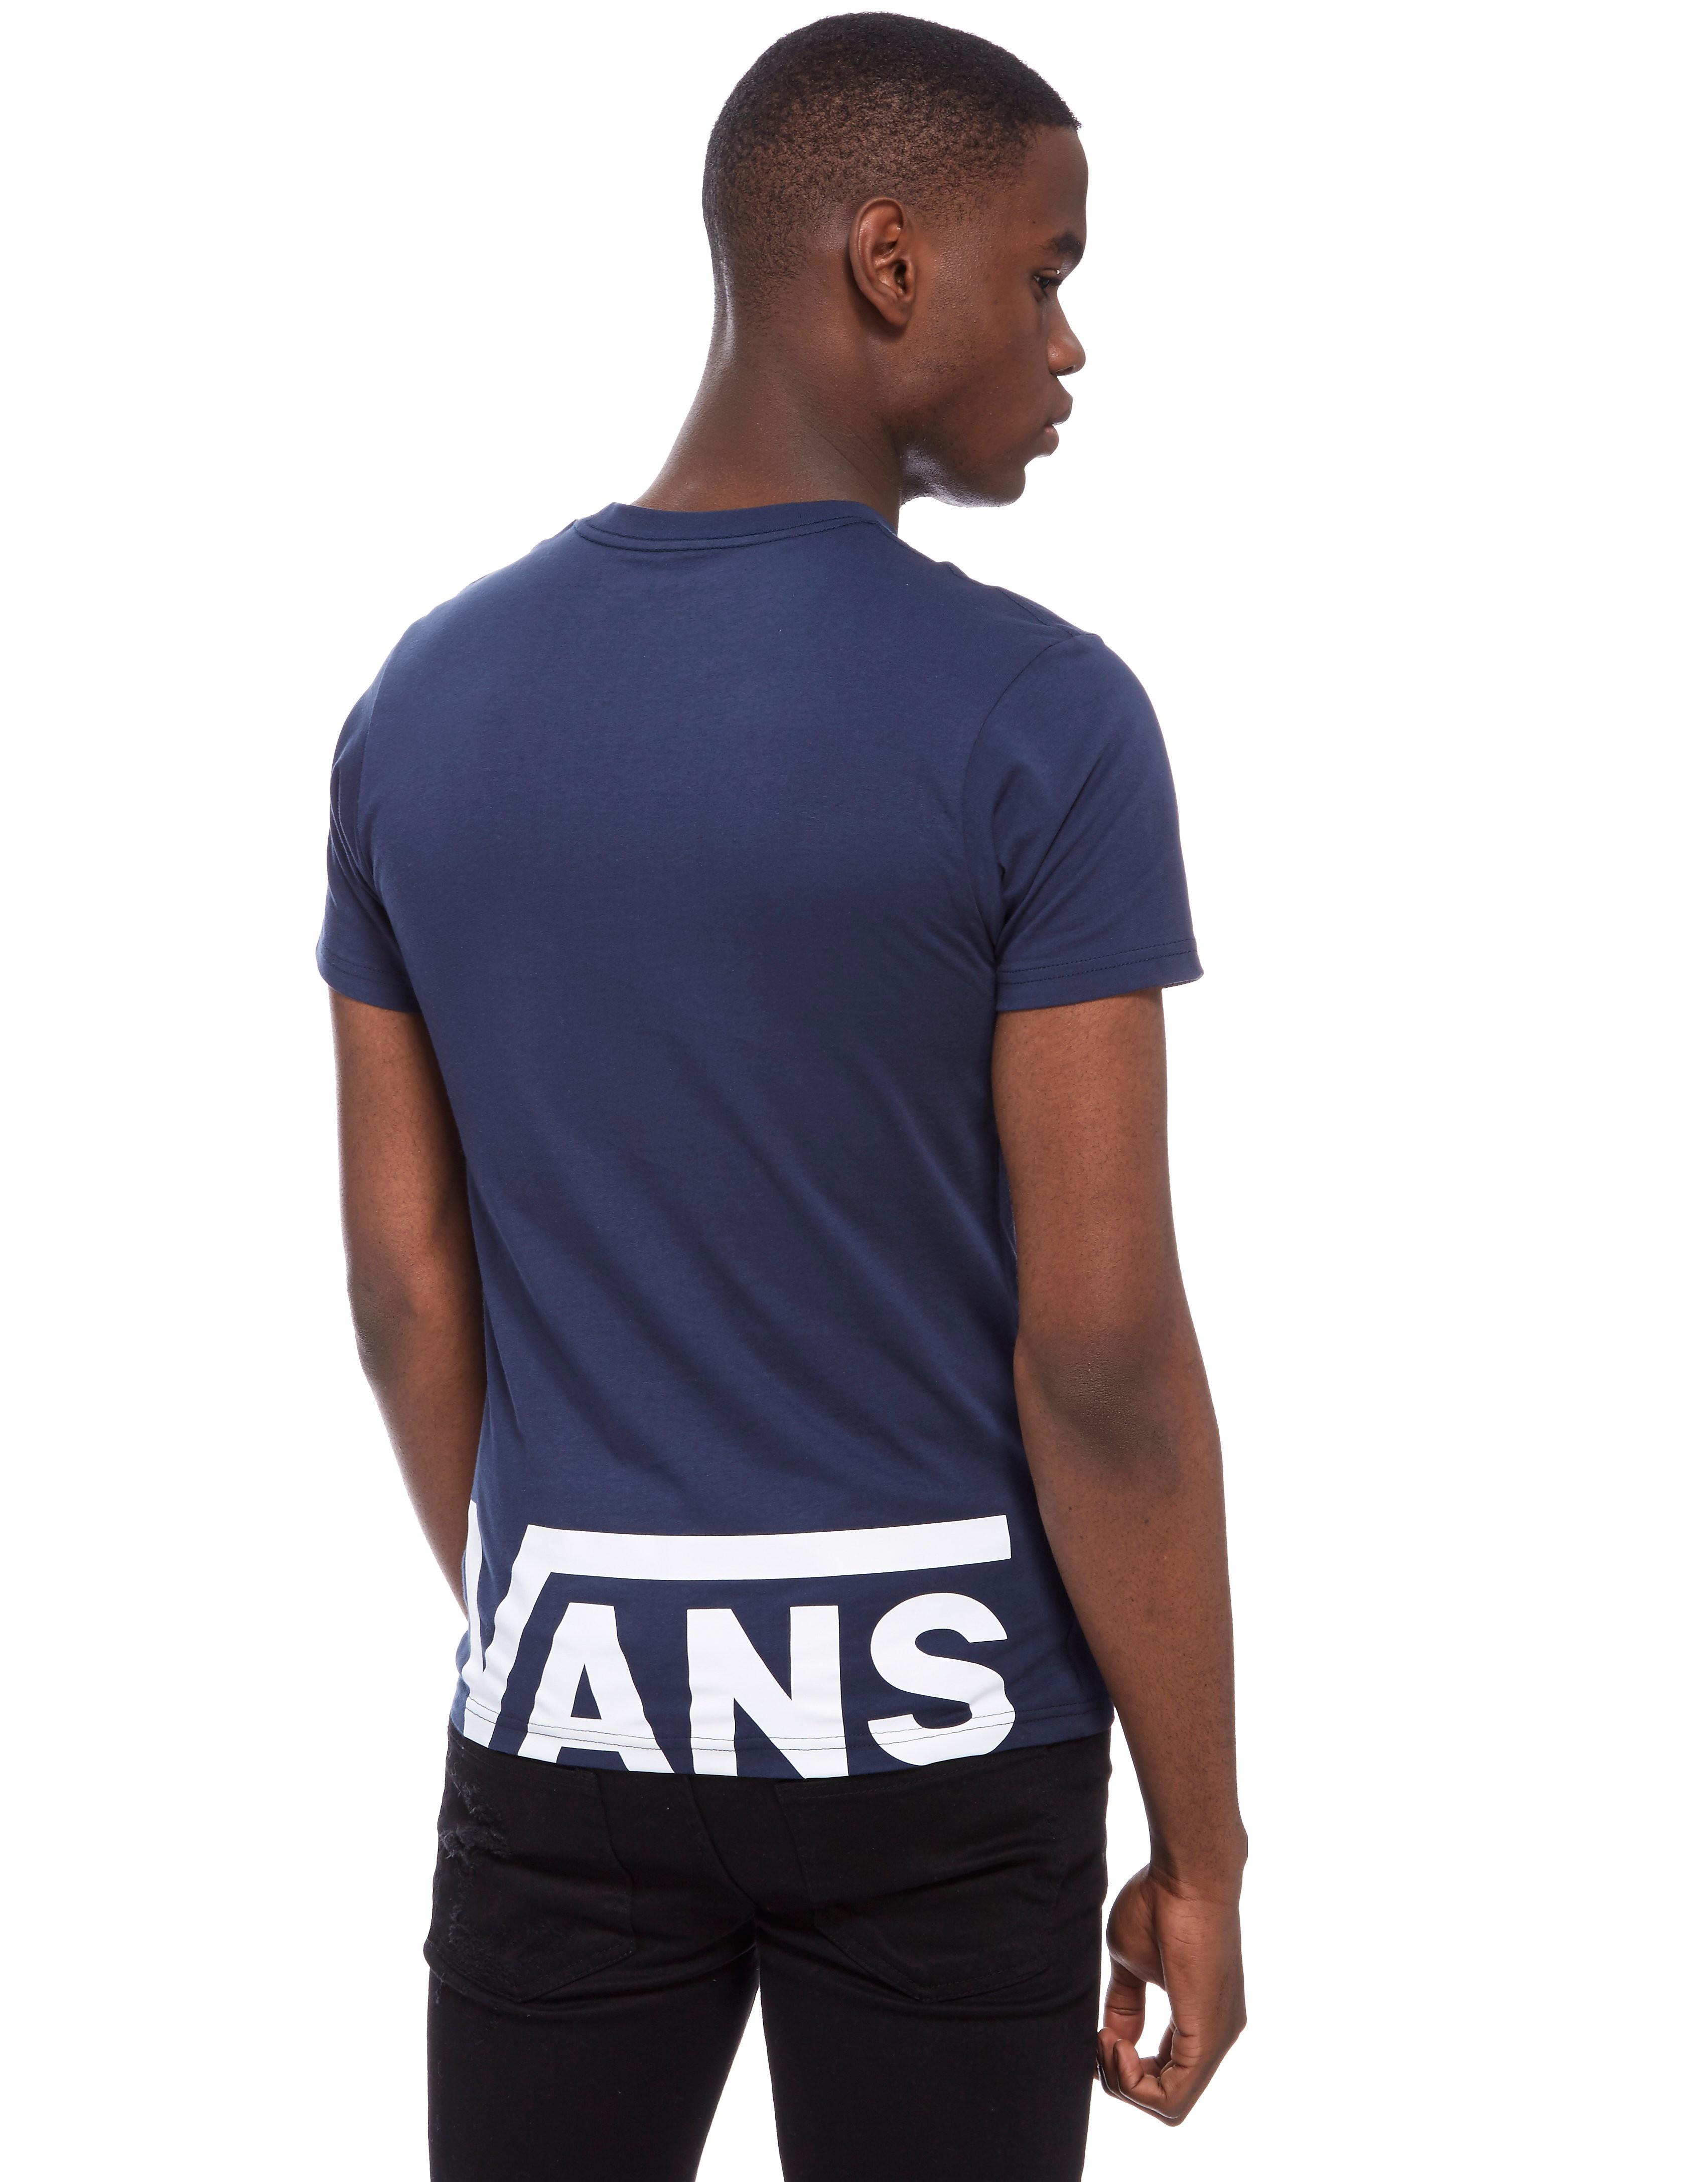 Vans Big Back Fly T-Shirt